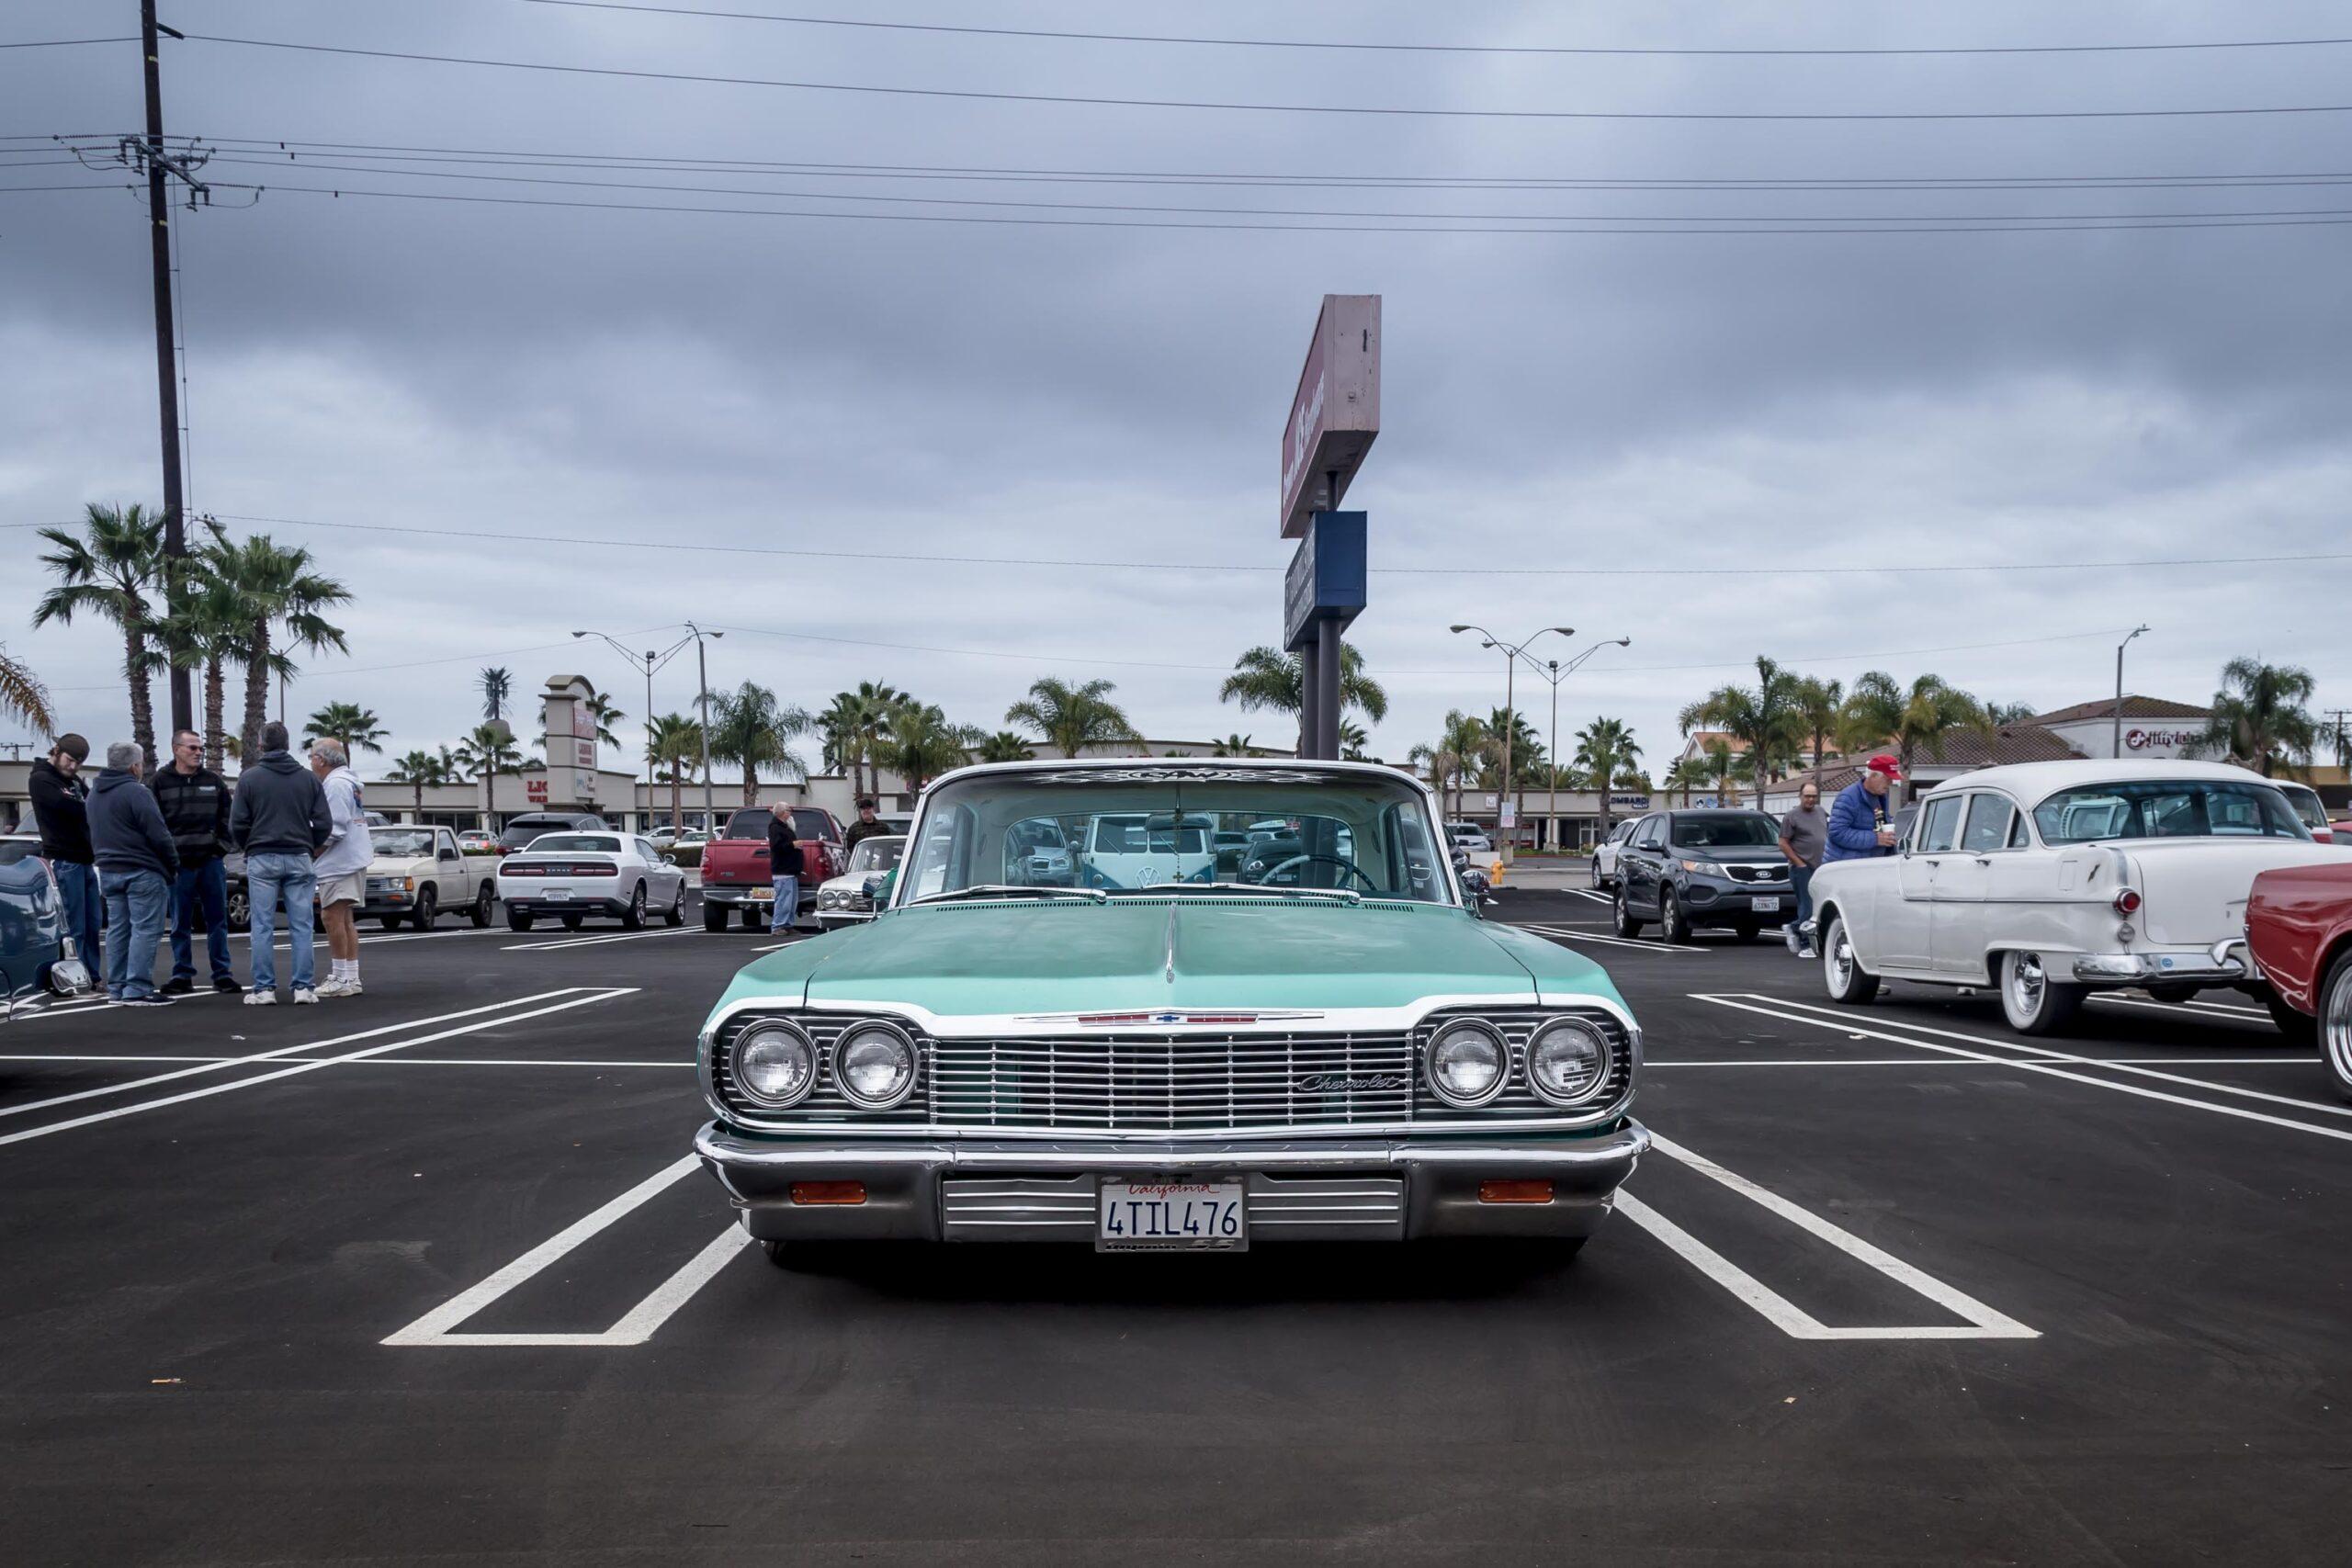 1964 Chevy Impala lowrider at Donut Derelicts breakfast meet